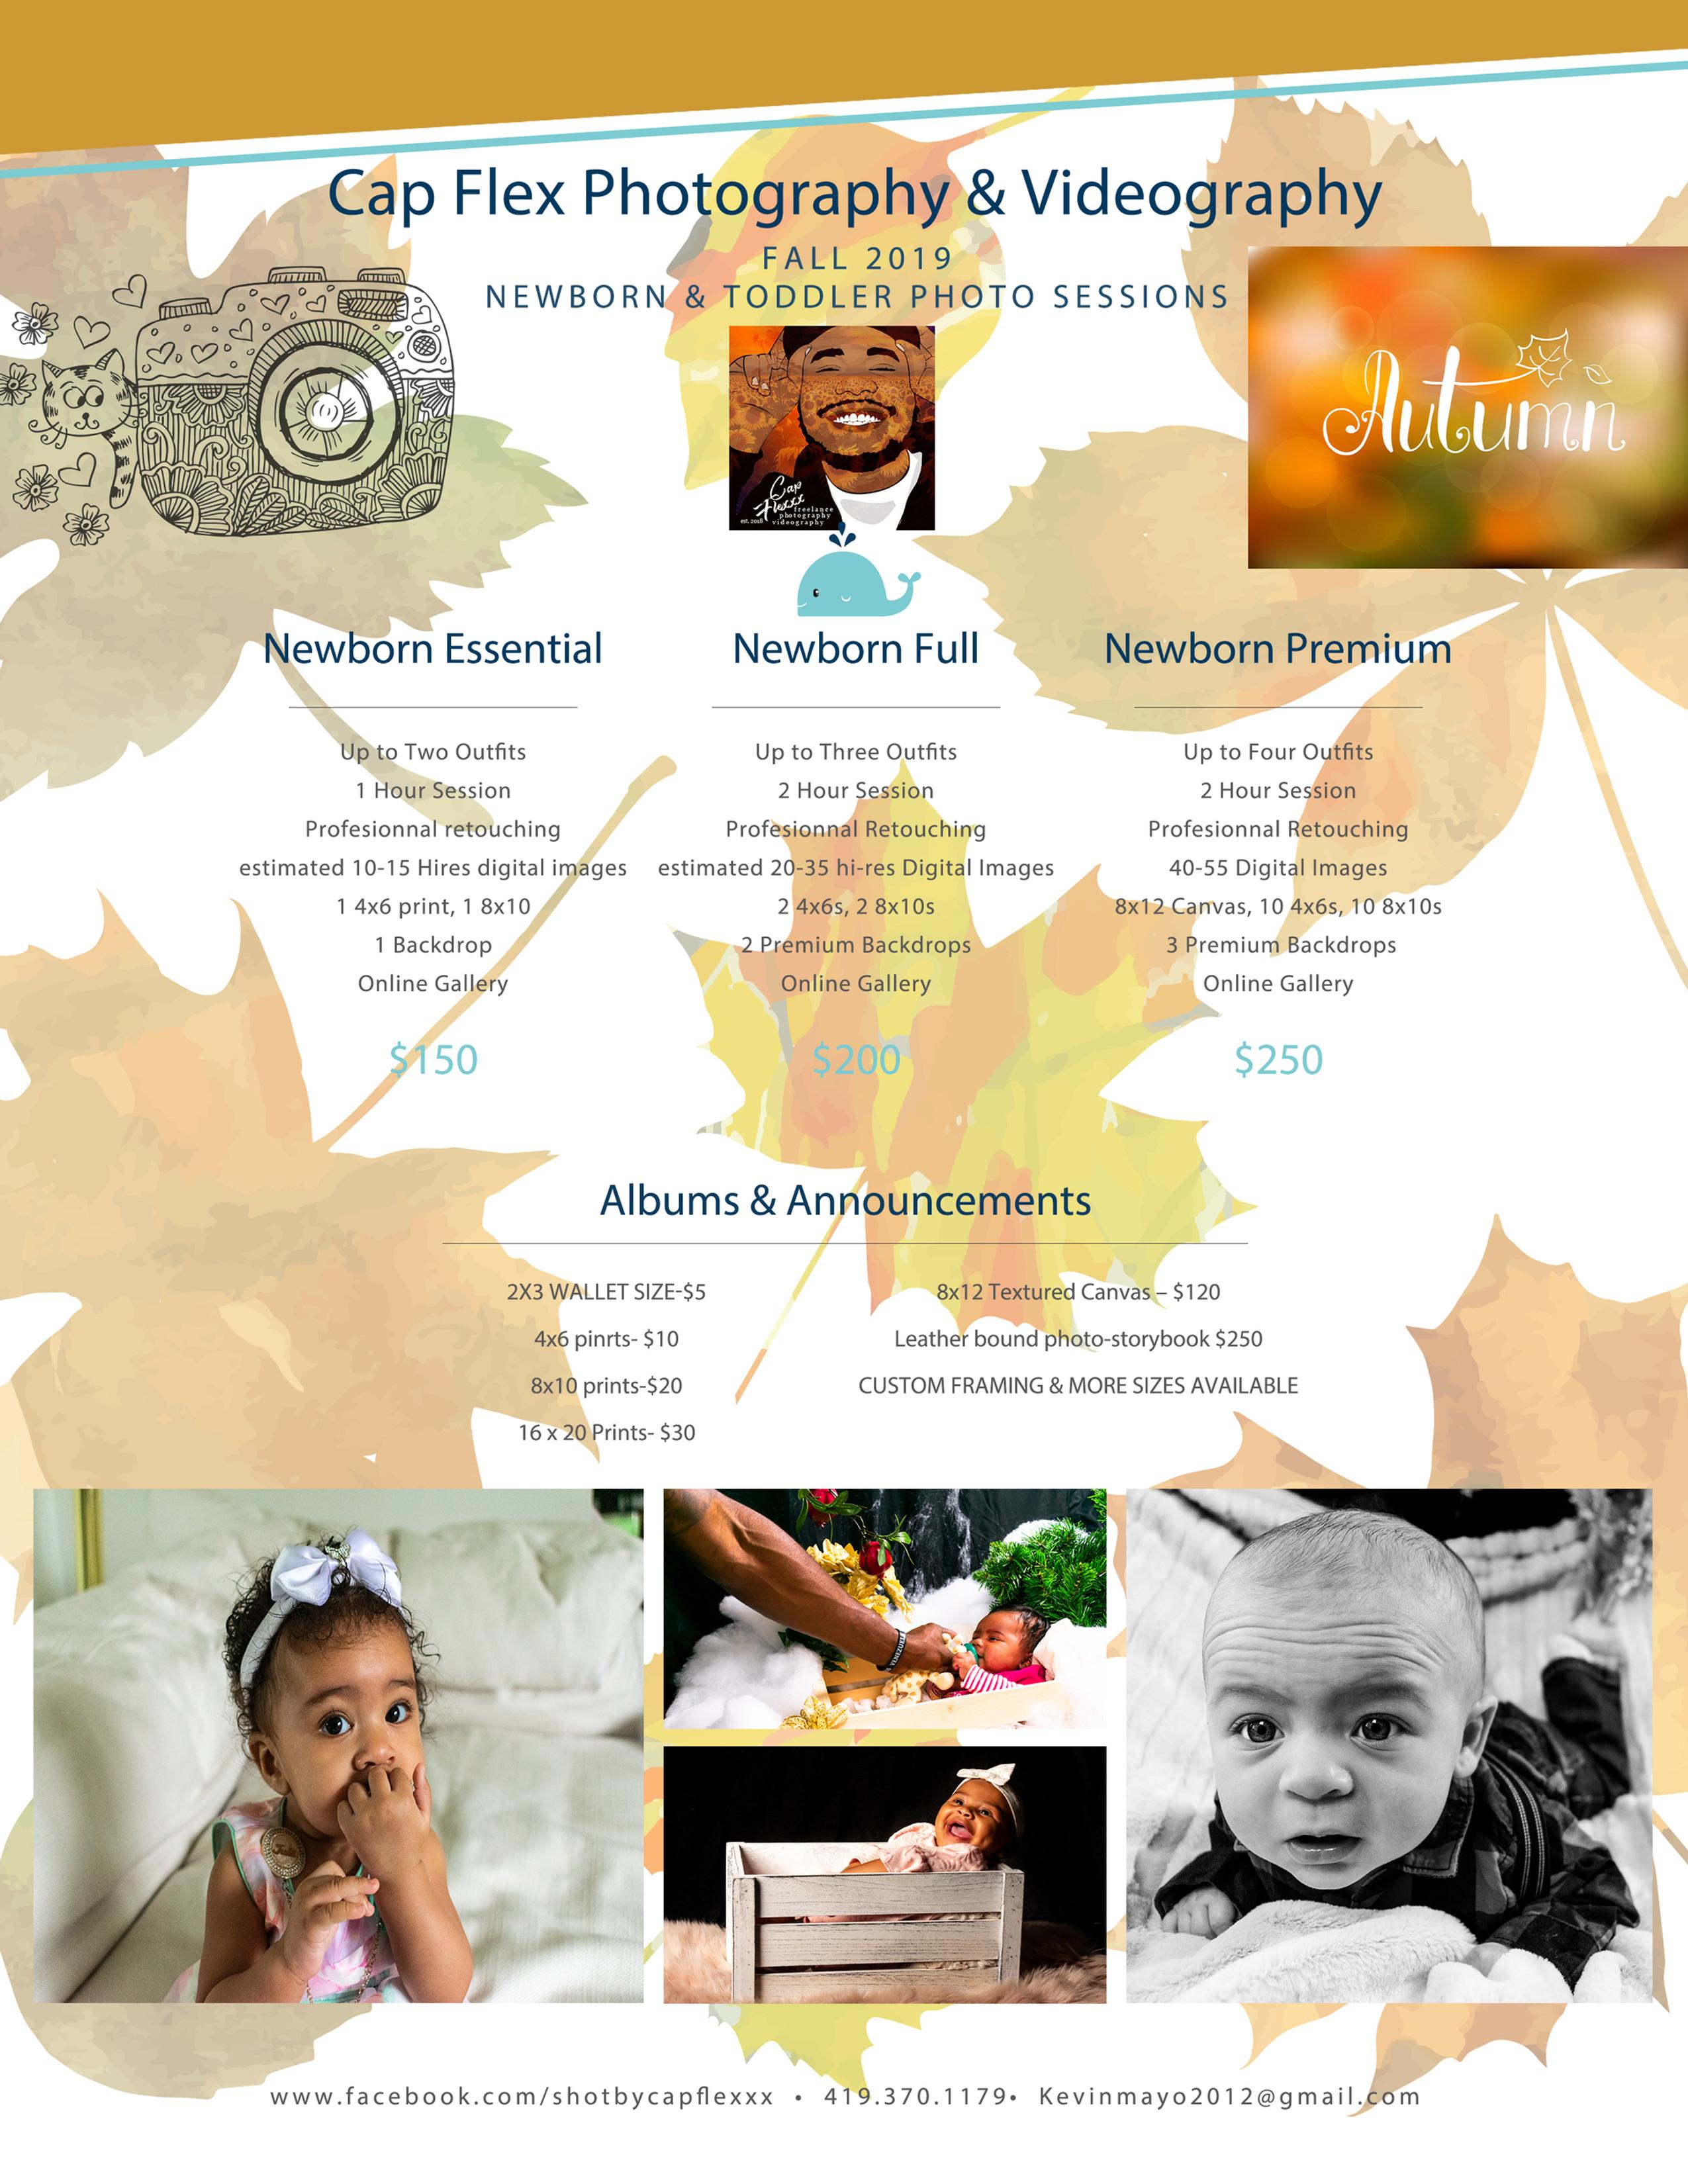 Newborn & Toddler Photography